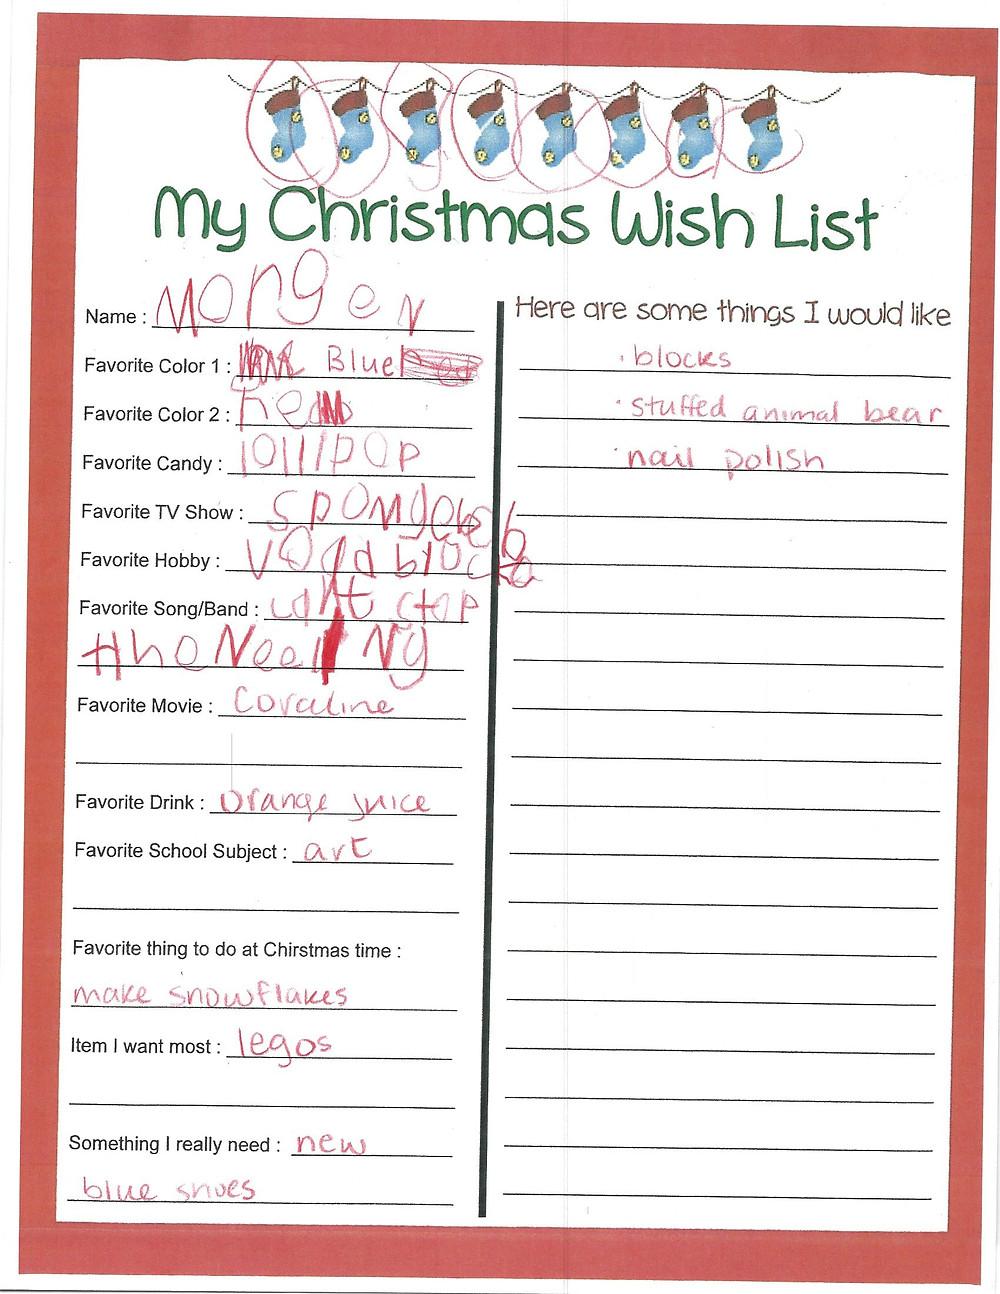 Morgen's Christmas Wish List